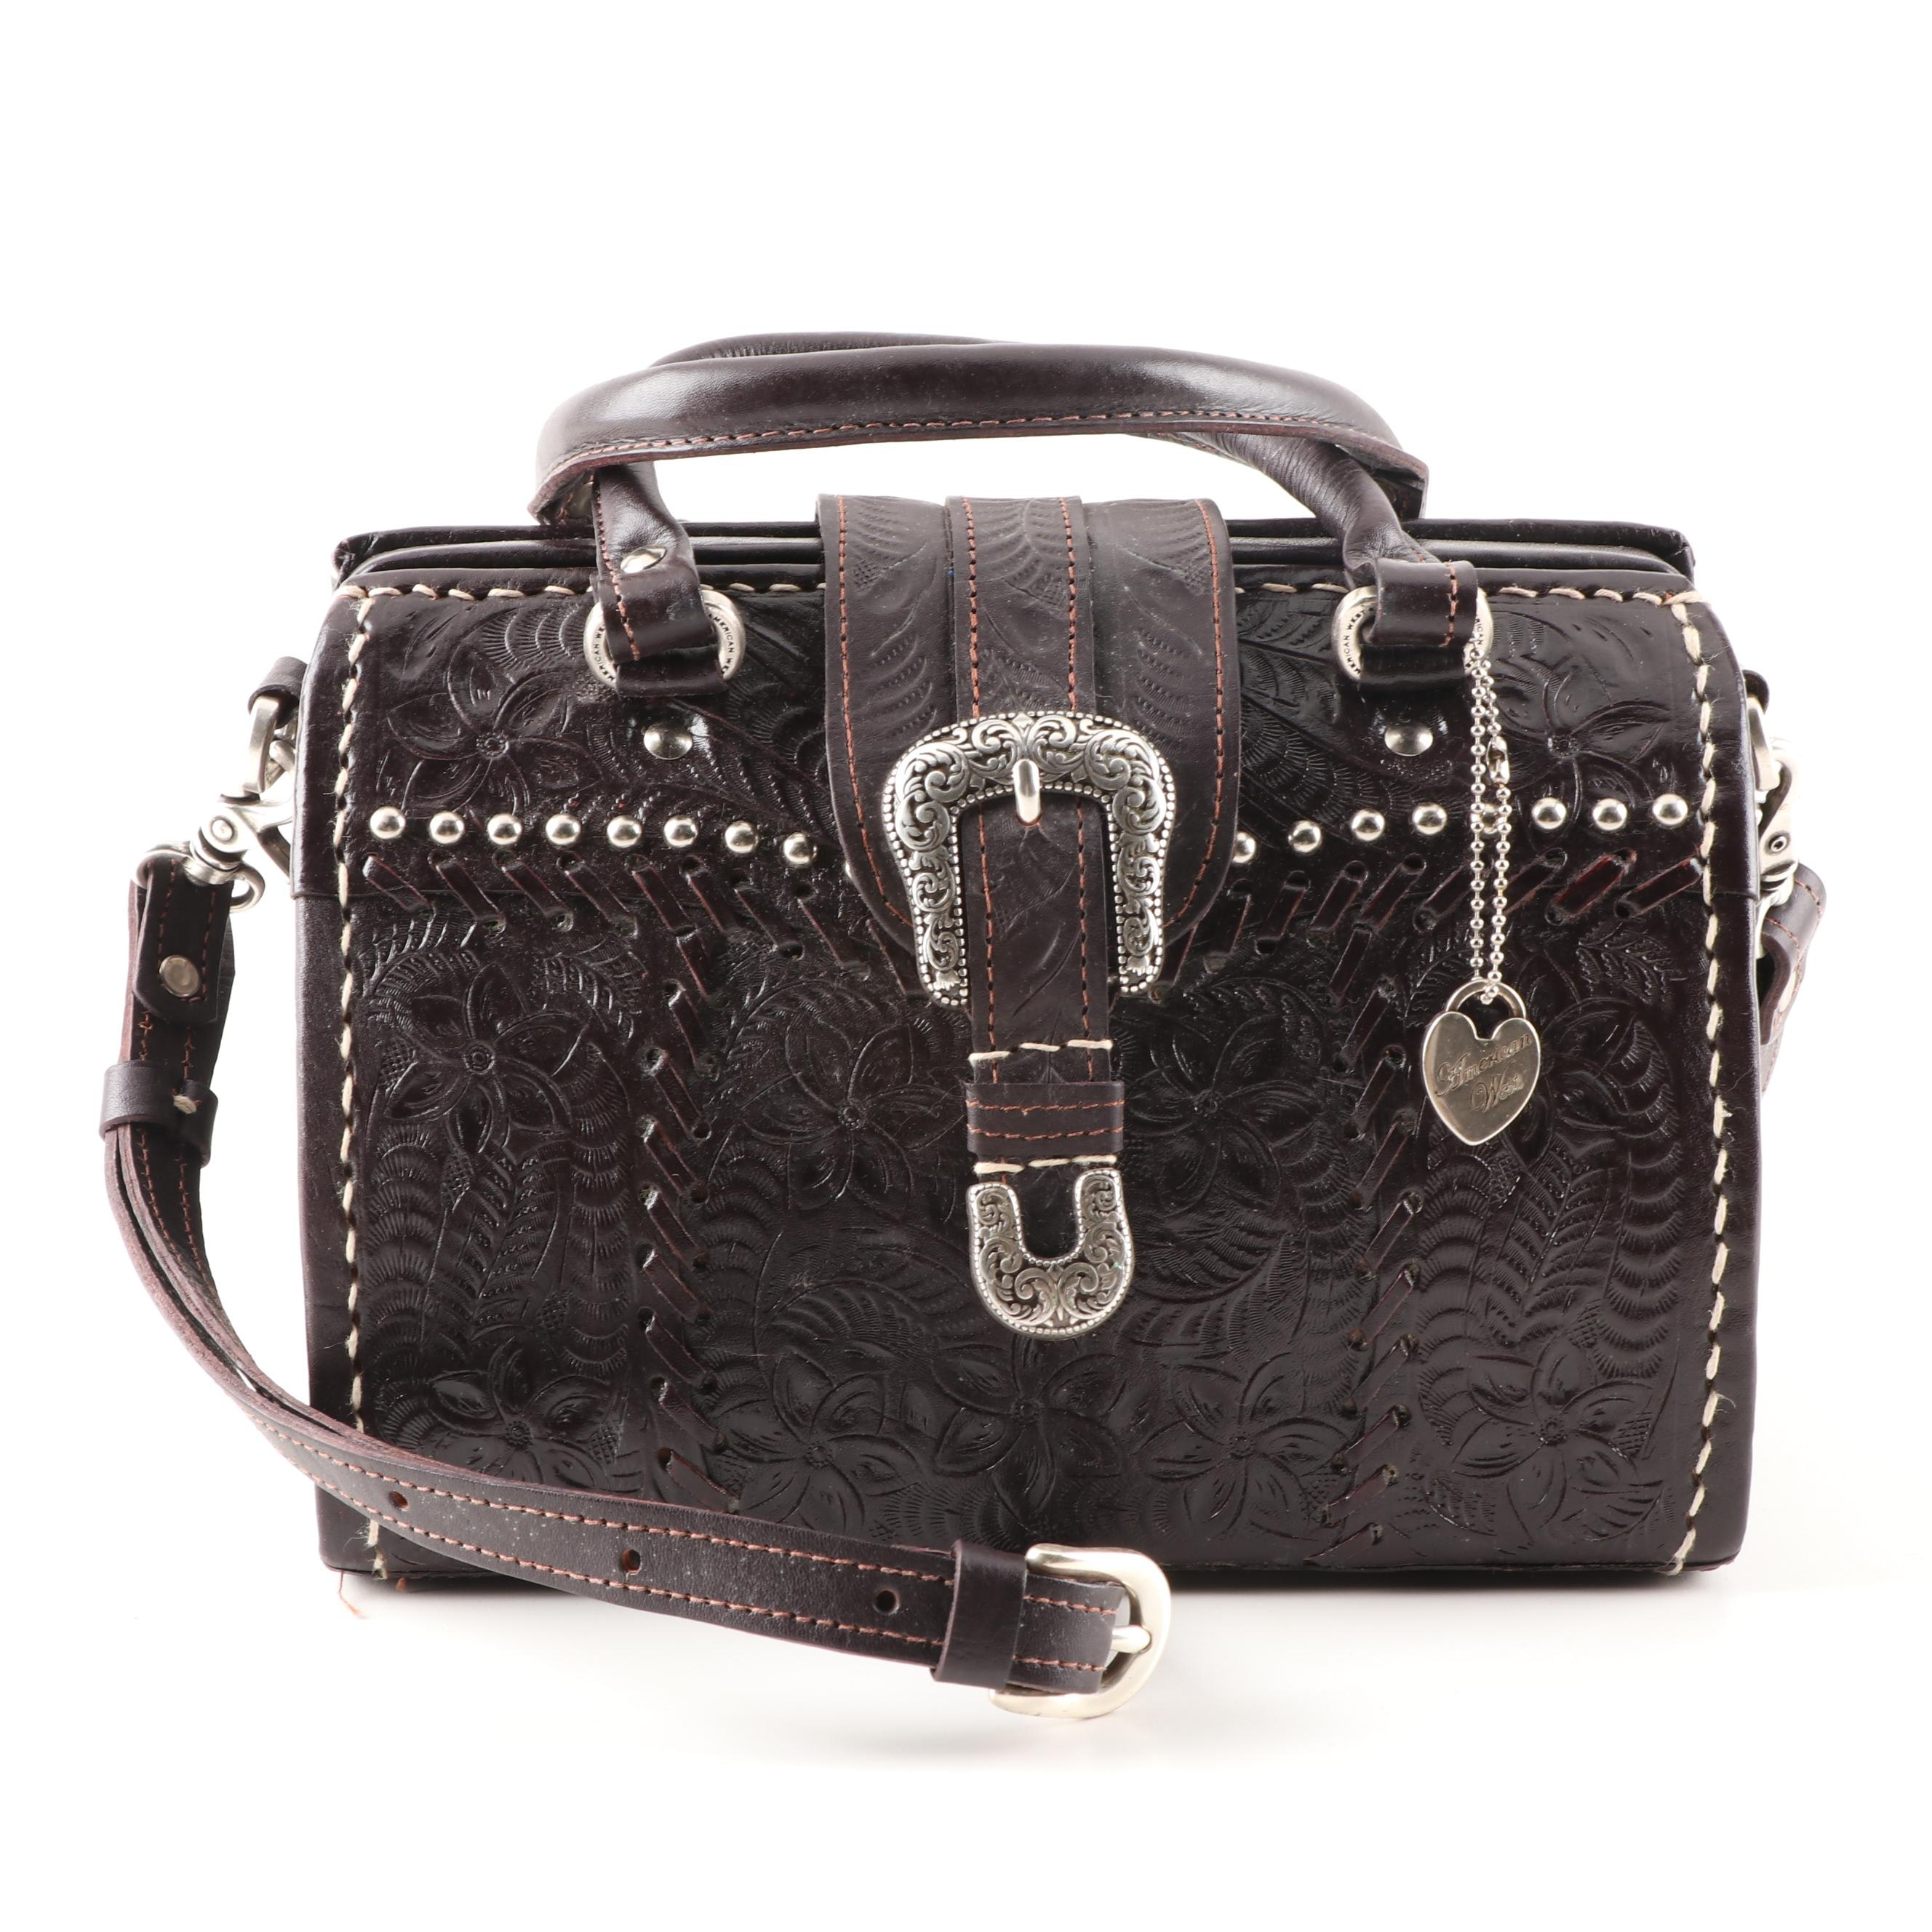 American West Tooled Leather Handbag